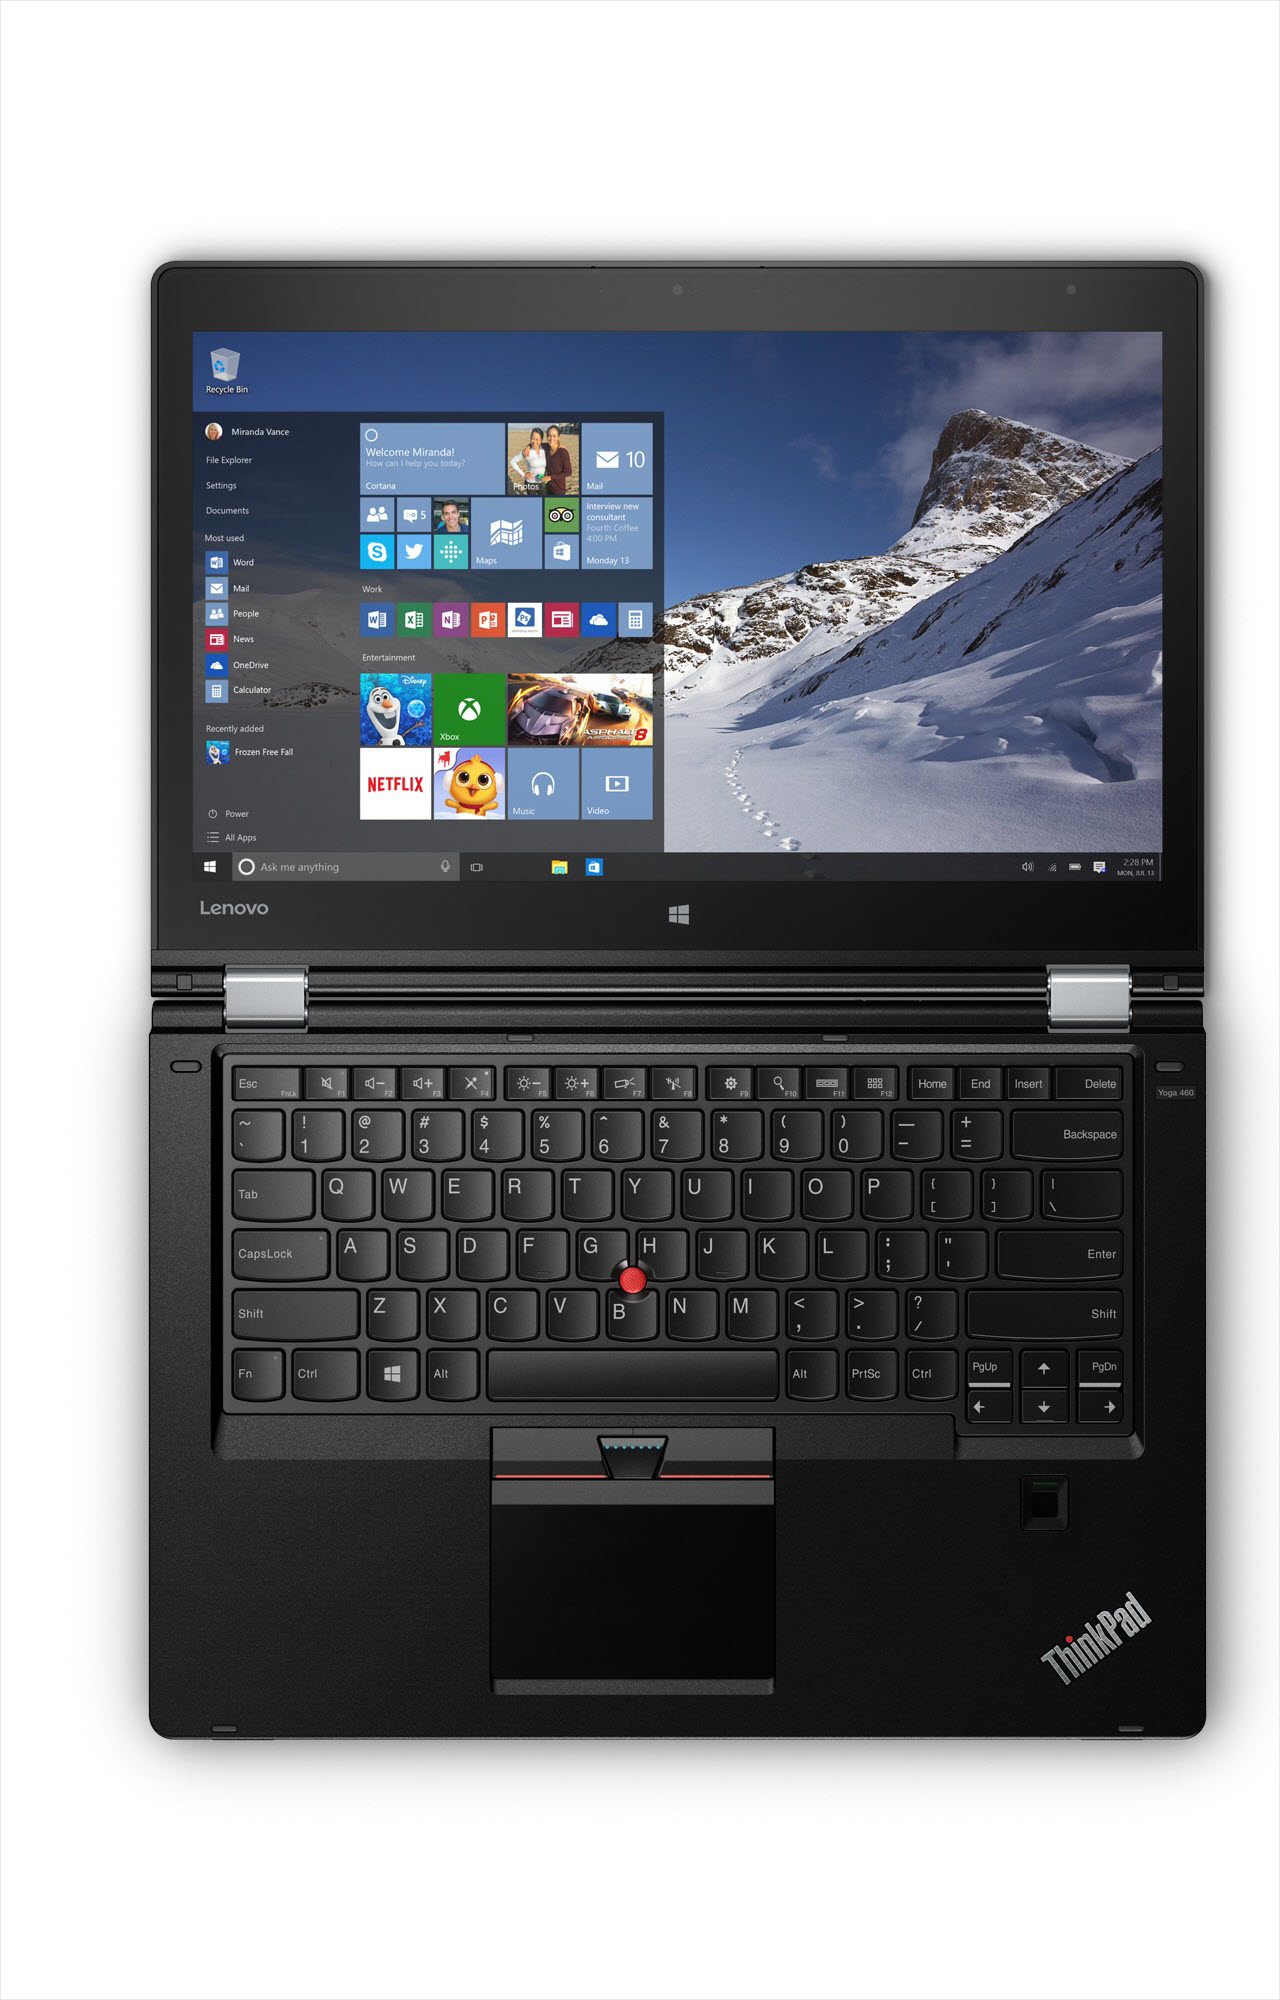 "Lenovo ThinkPad Yoga 460 2.5GHz i7-6500U 14"" 1920 x 1080pixels Touchscreen Black"